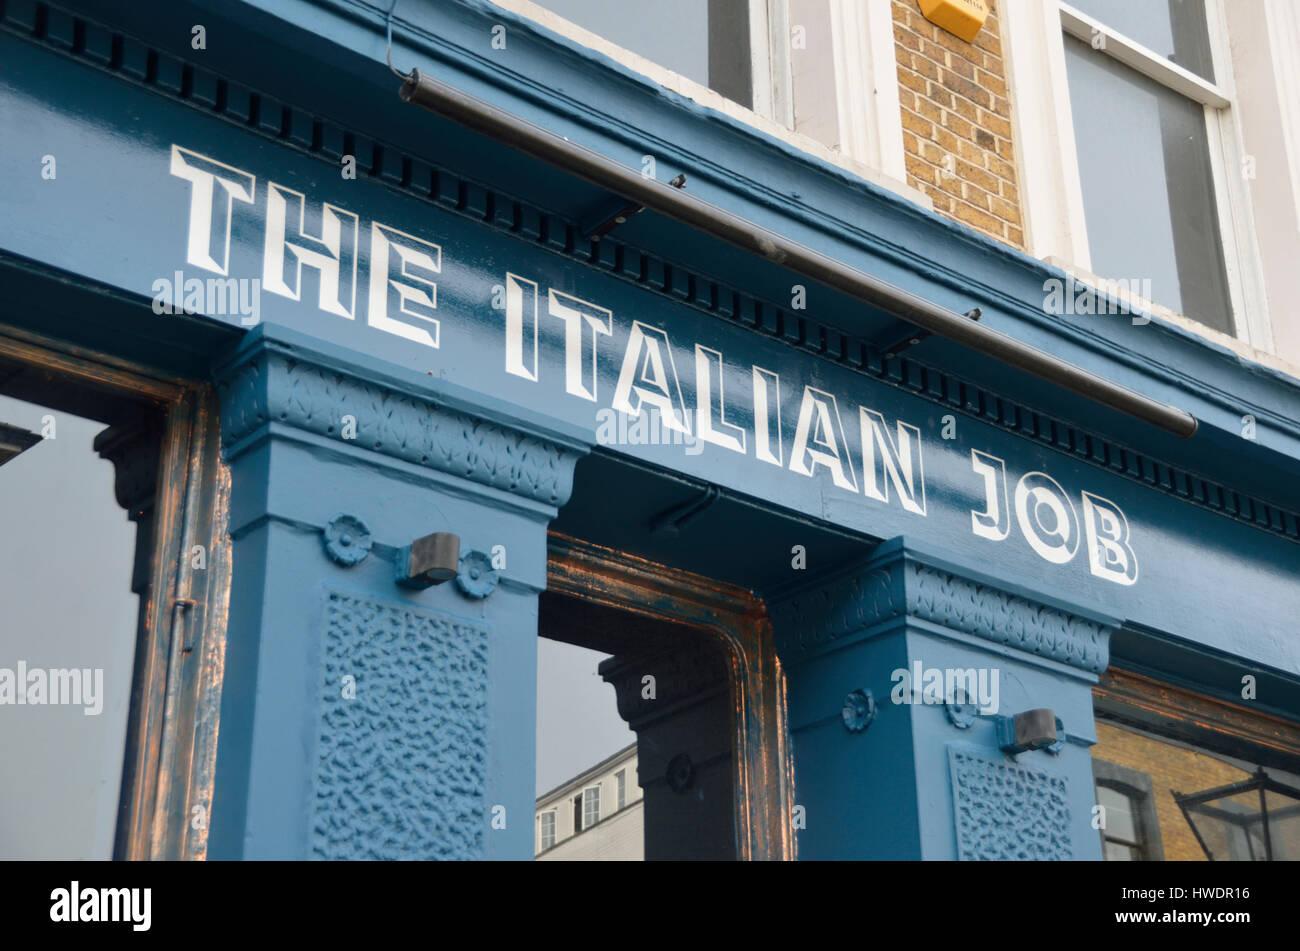 The Italian Job pub in All Saints Road, Notting Hill, London, UK. - Stock Image